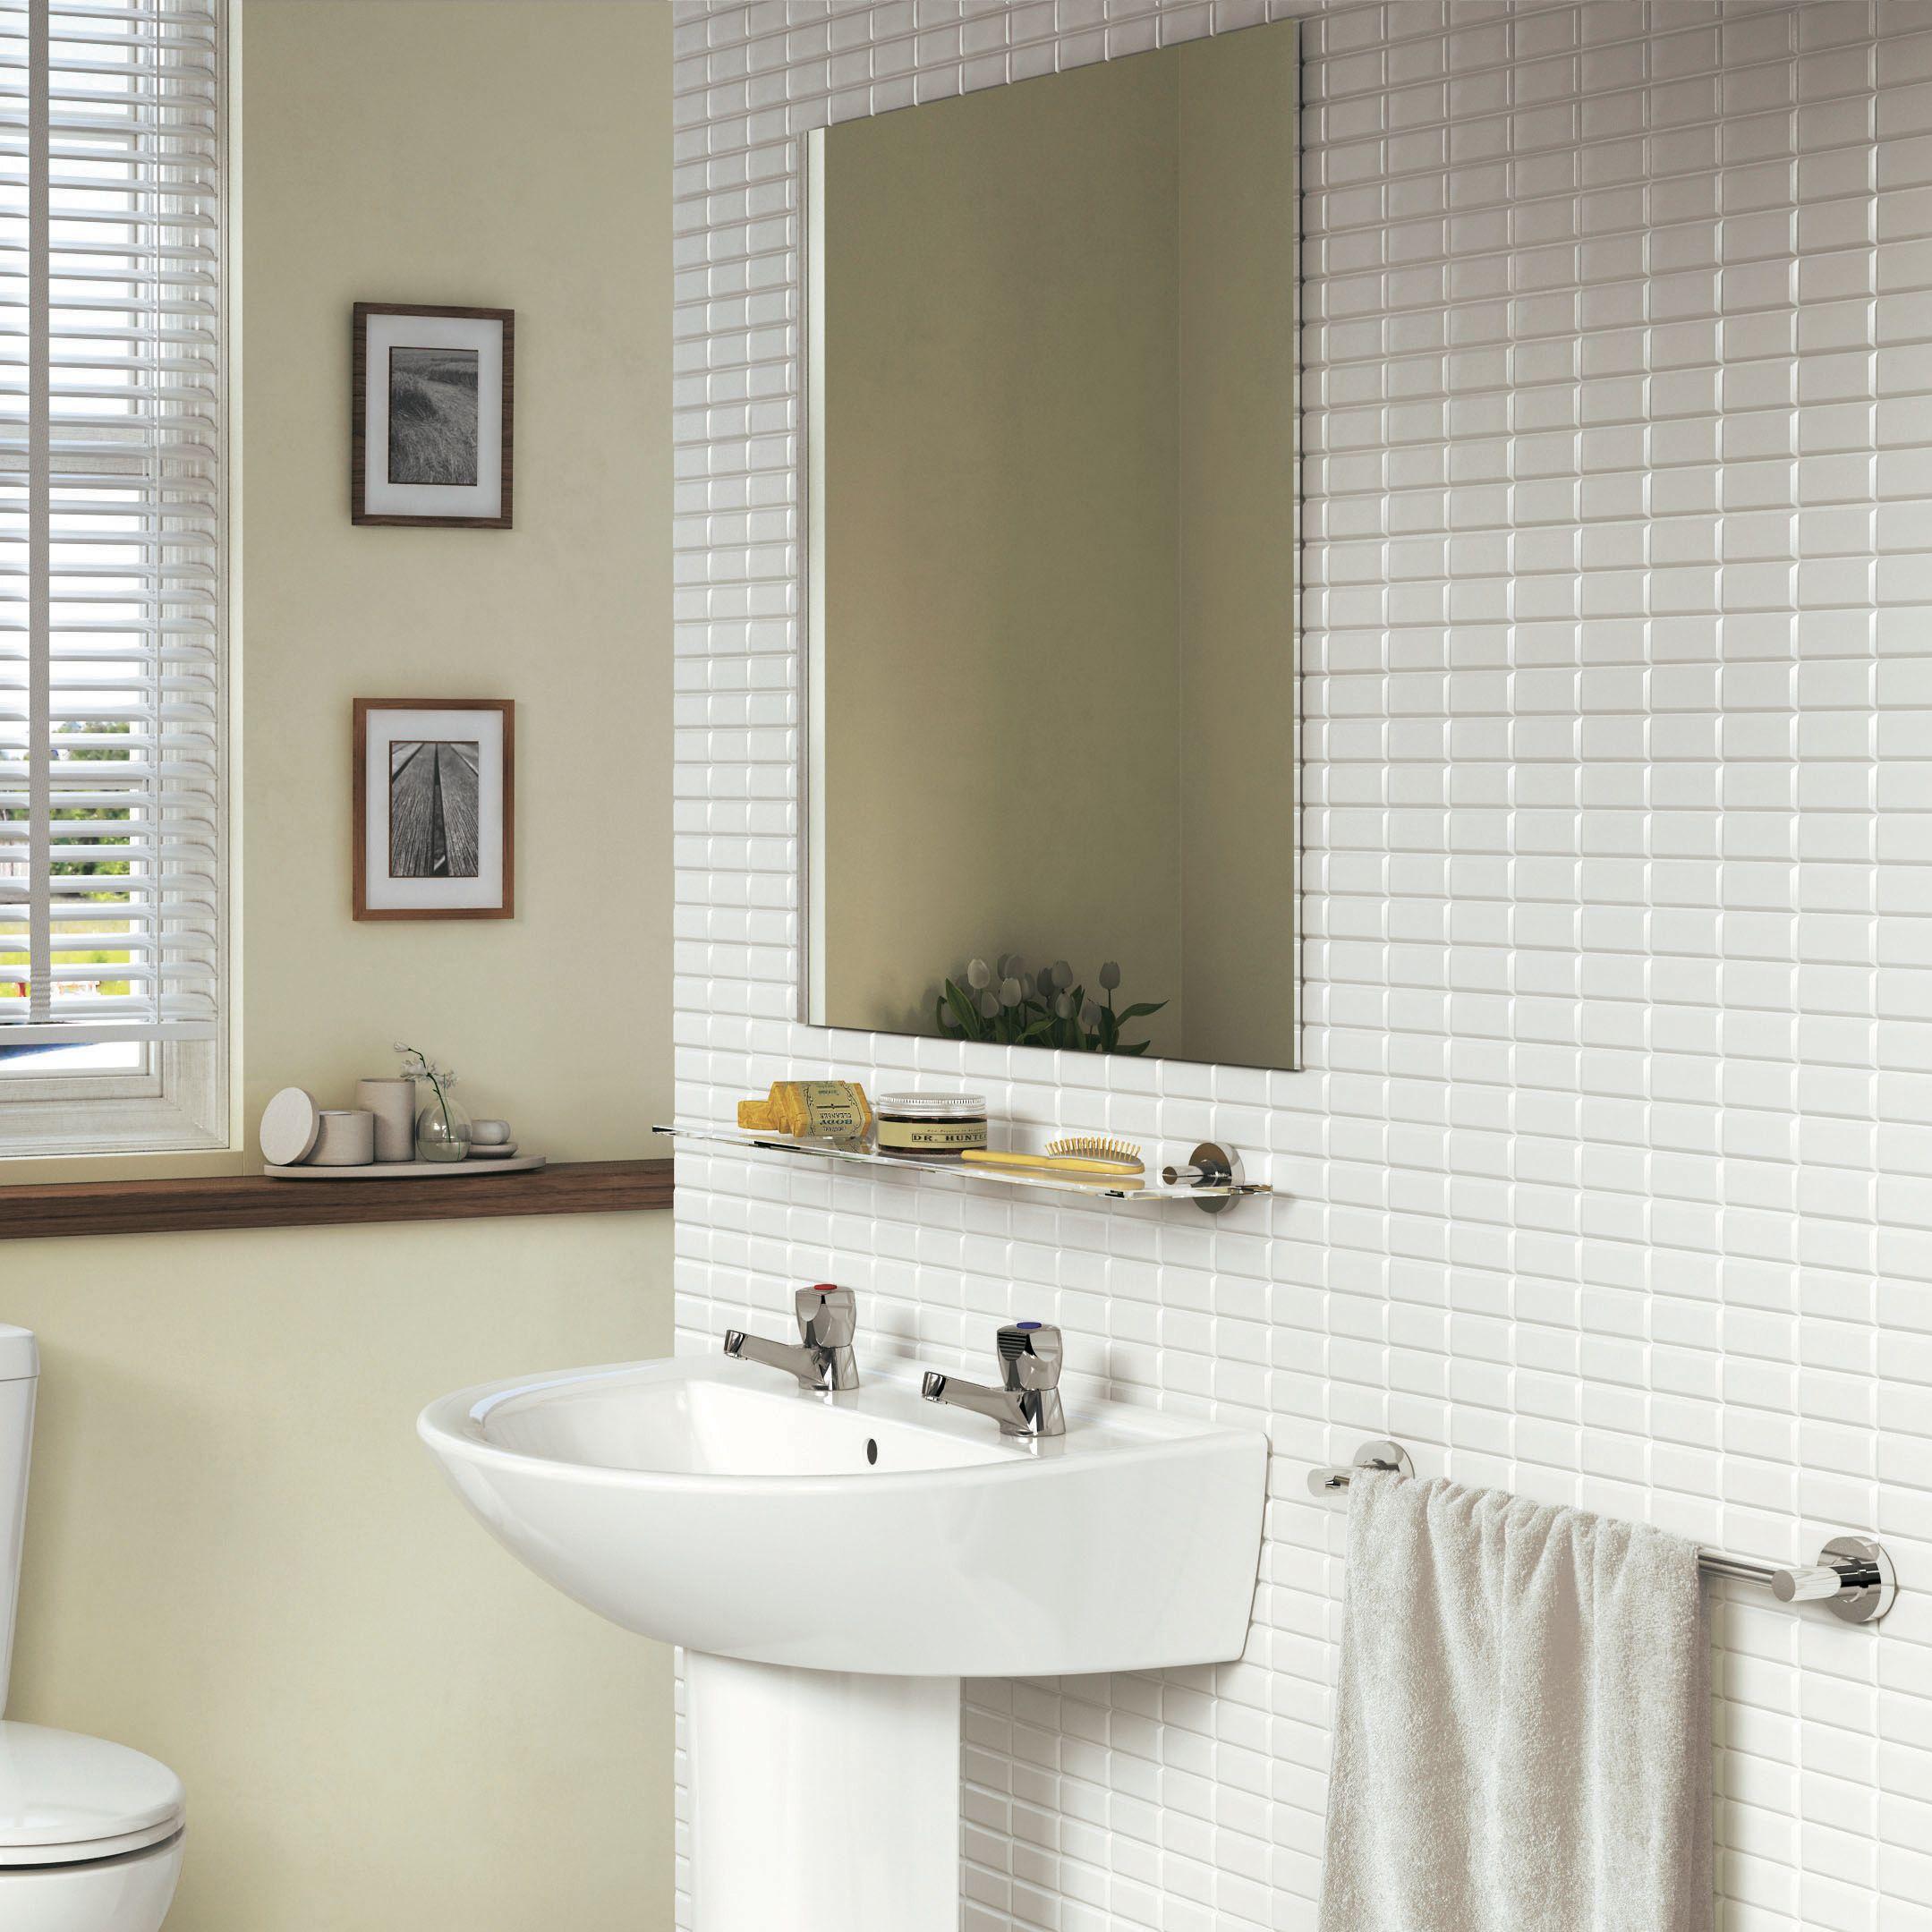 How to put up a bathroom mirror | Ideas & Advice | DIY at B&Q